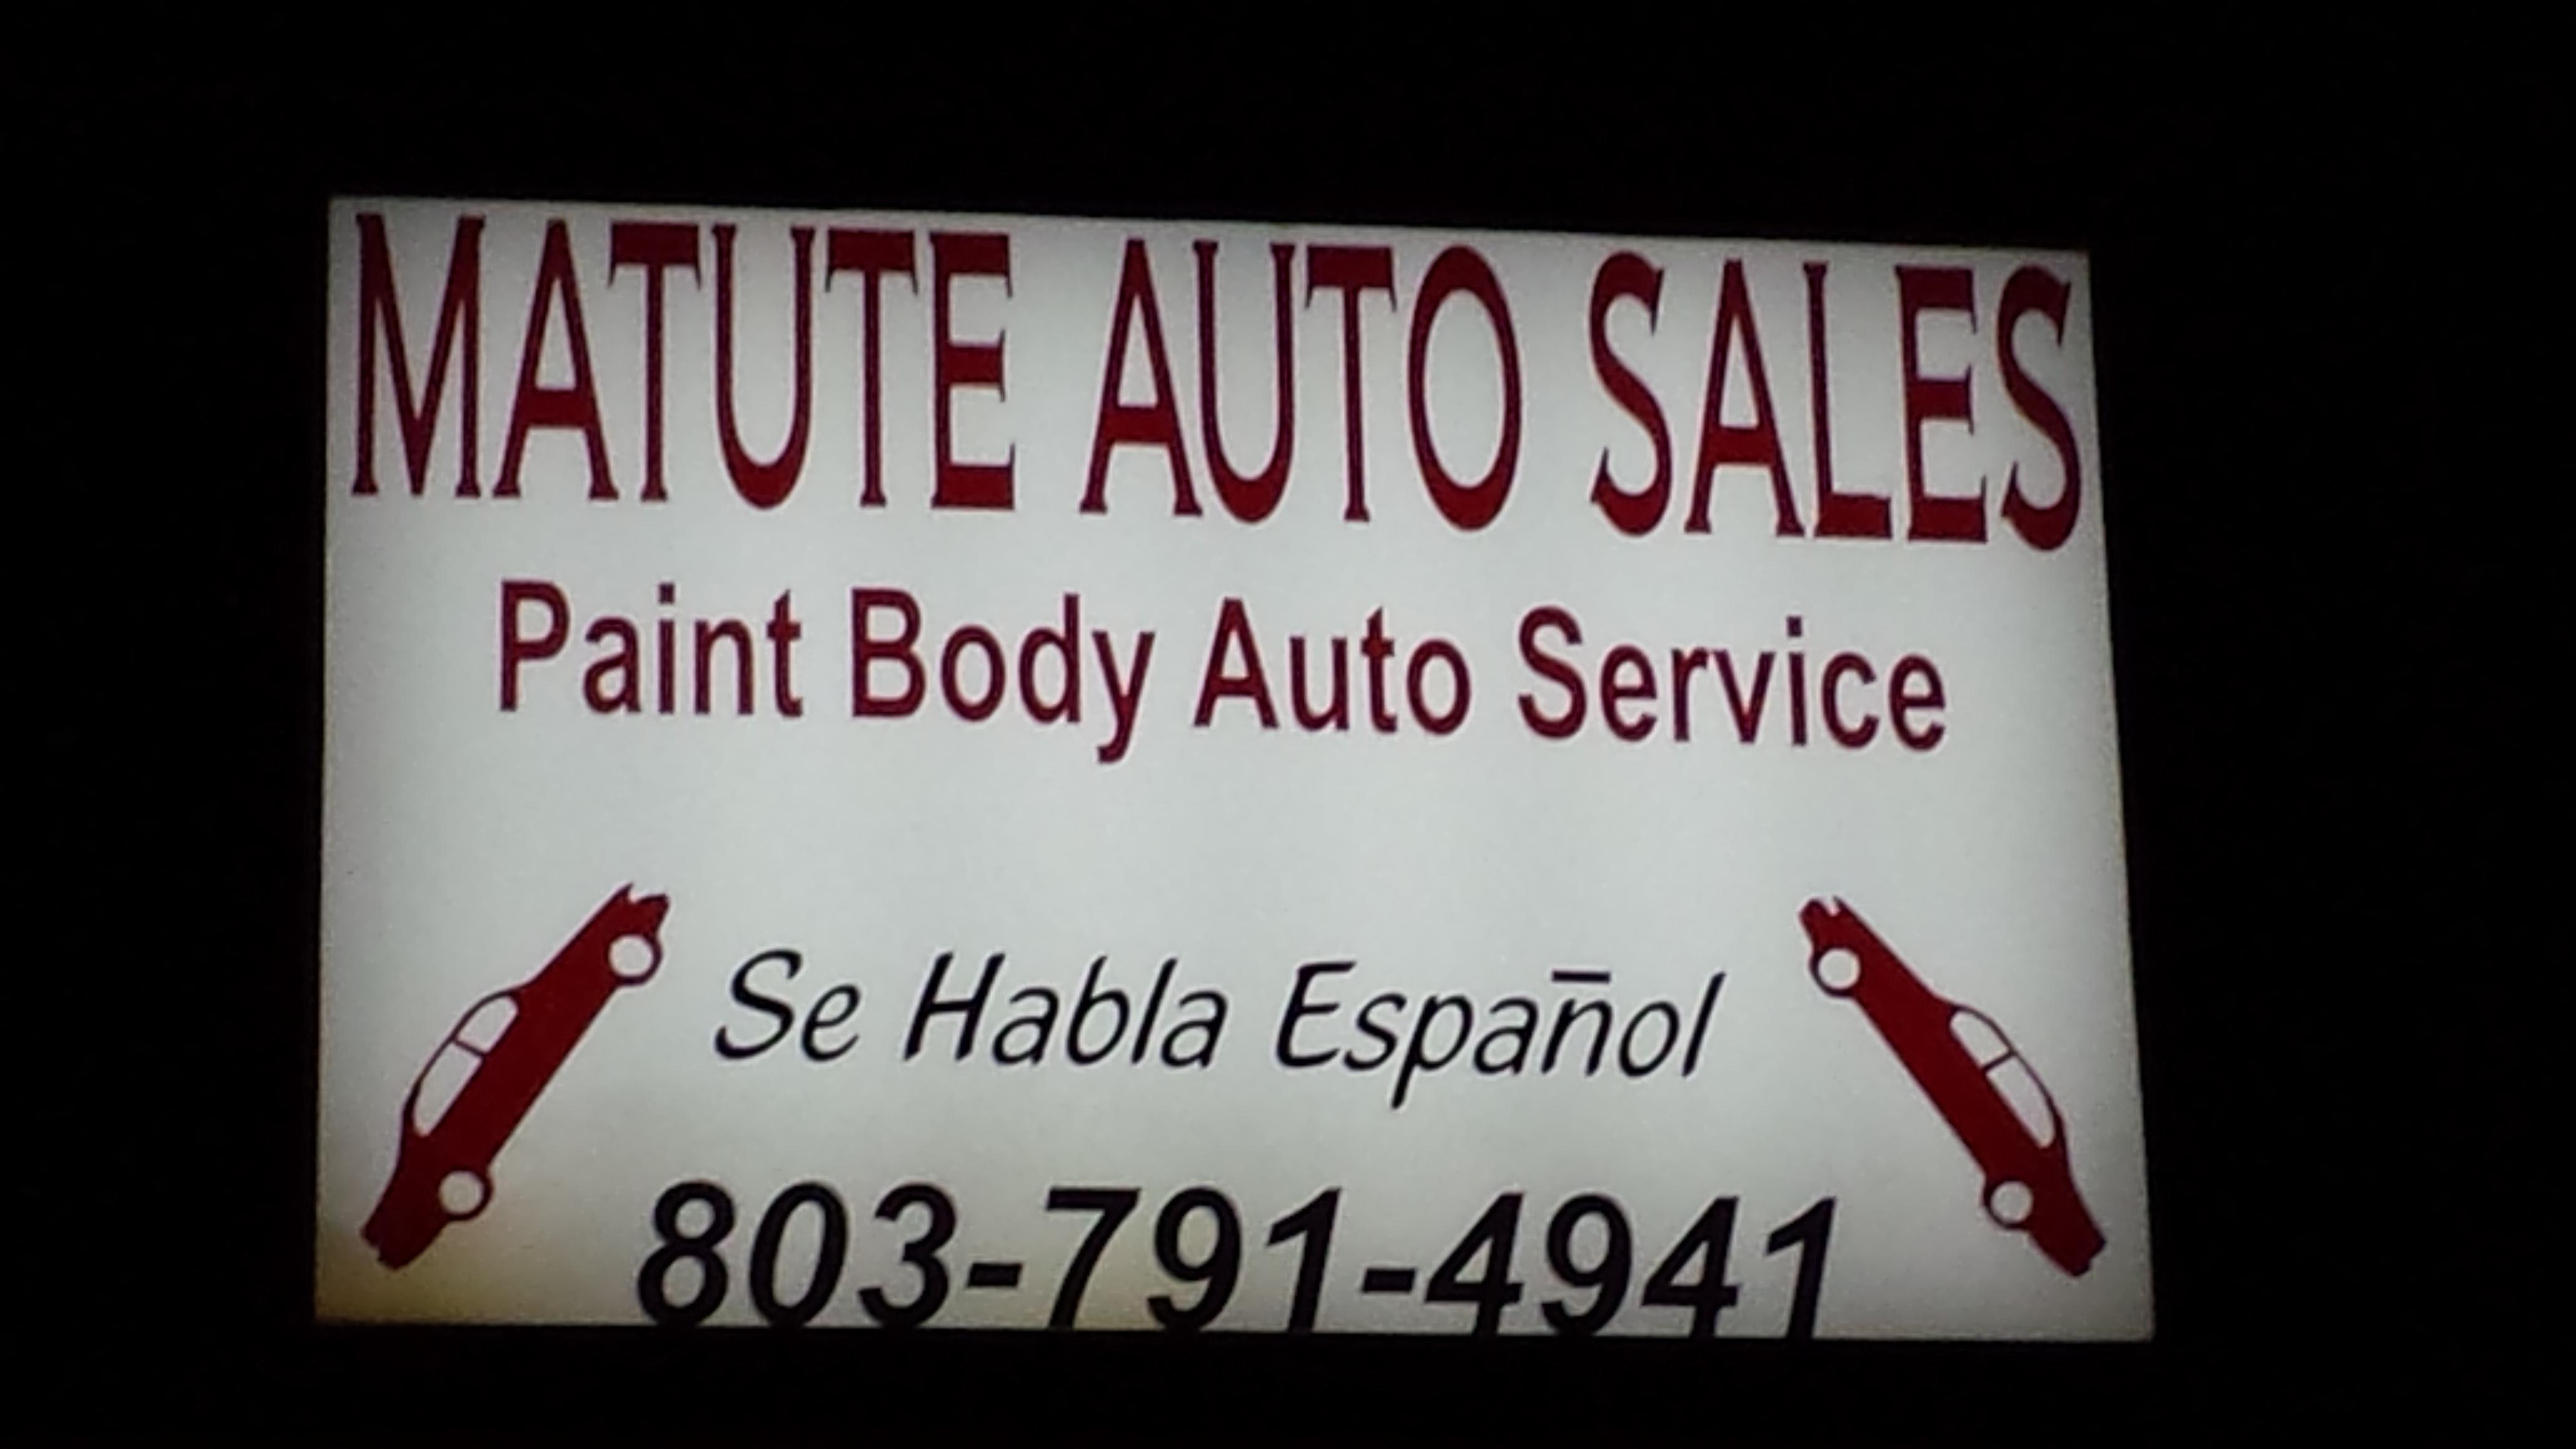 Matute Auto Sales, Gaston SC